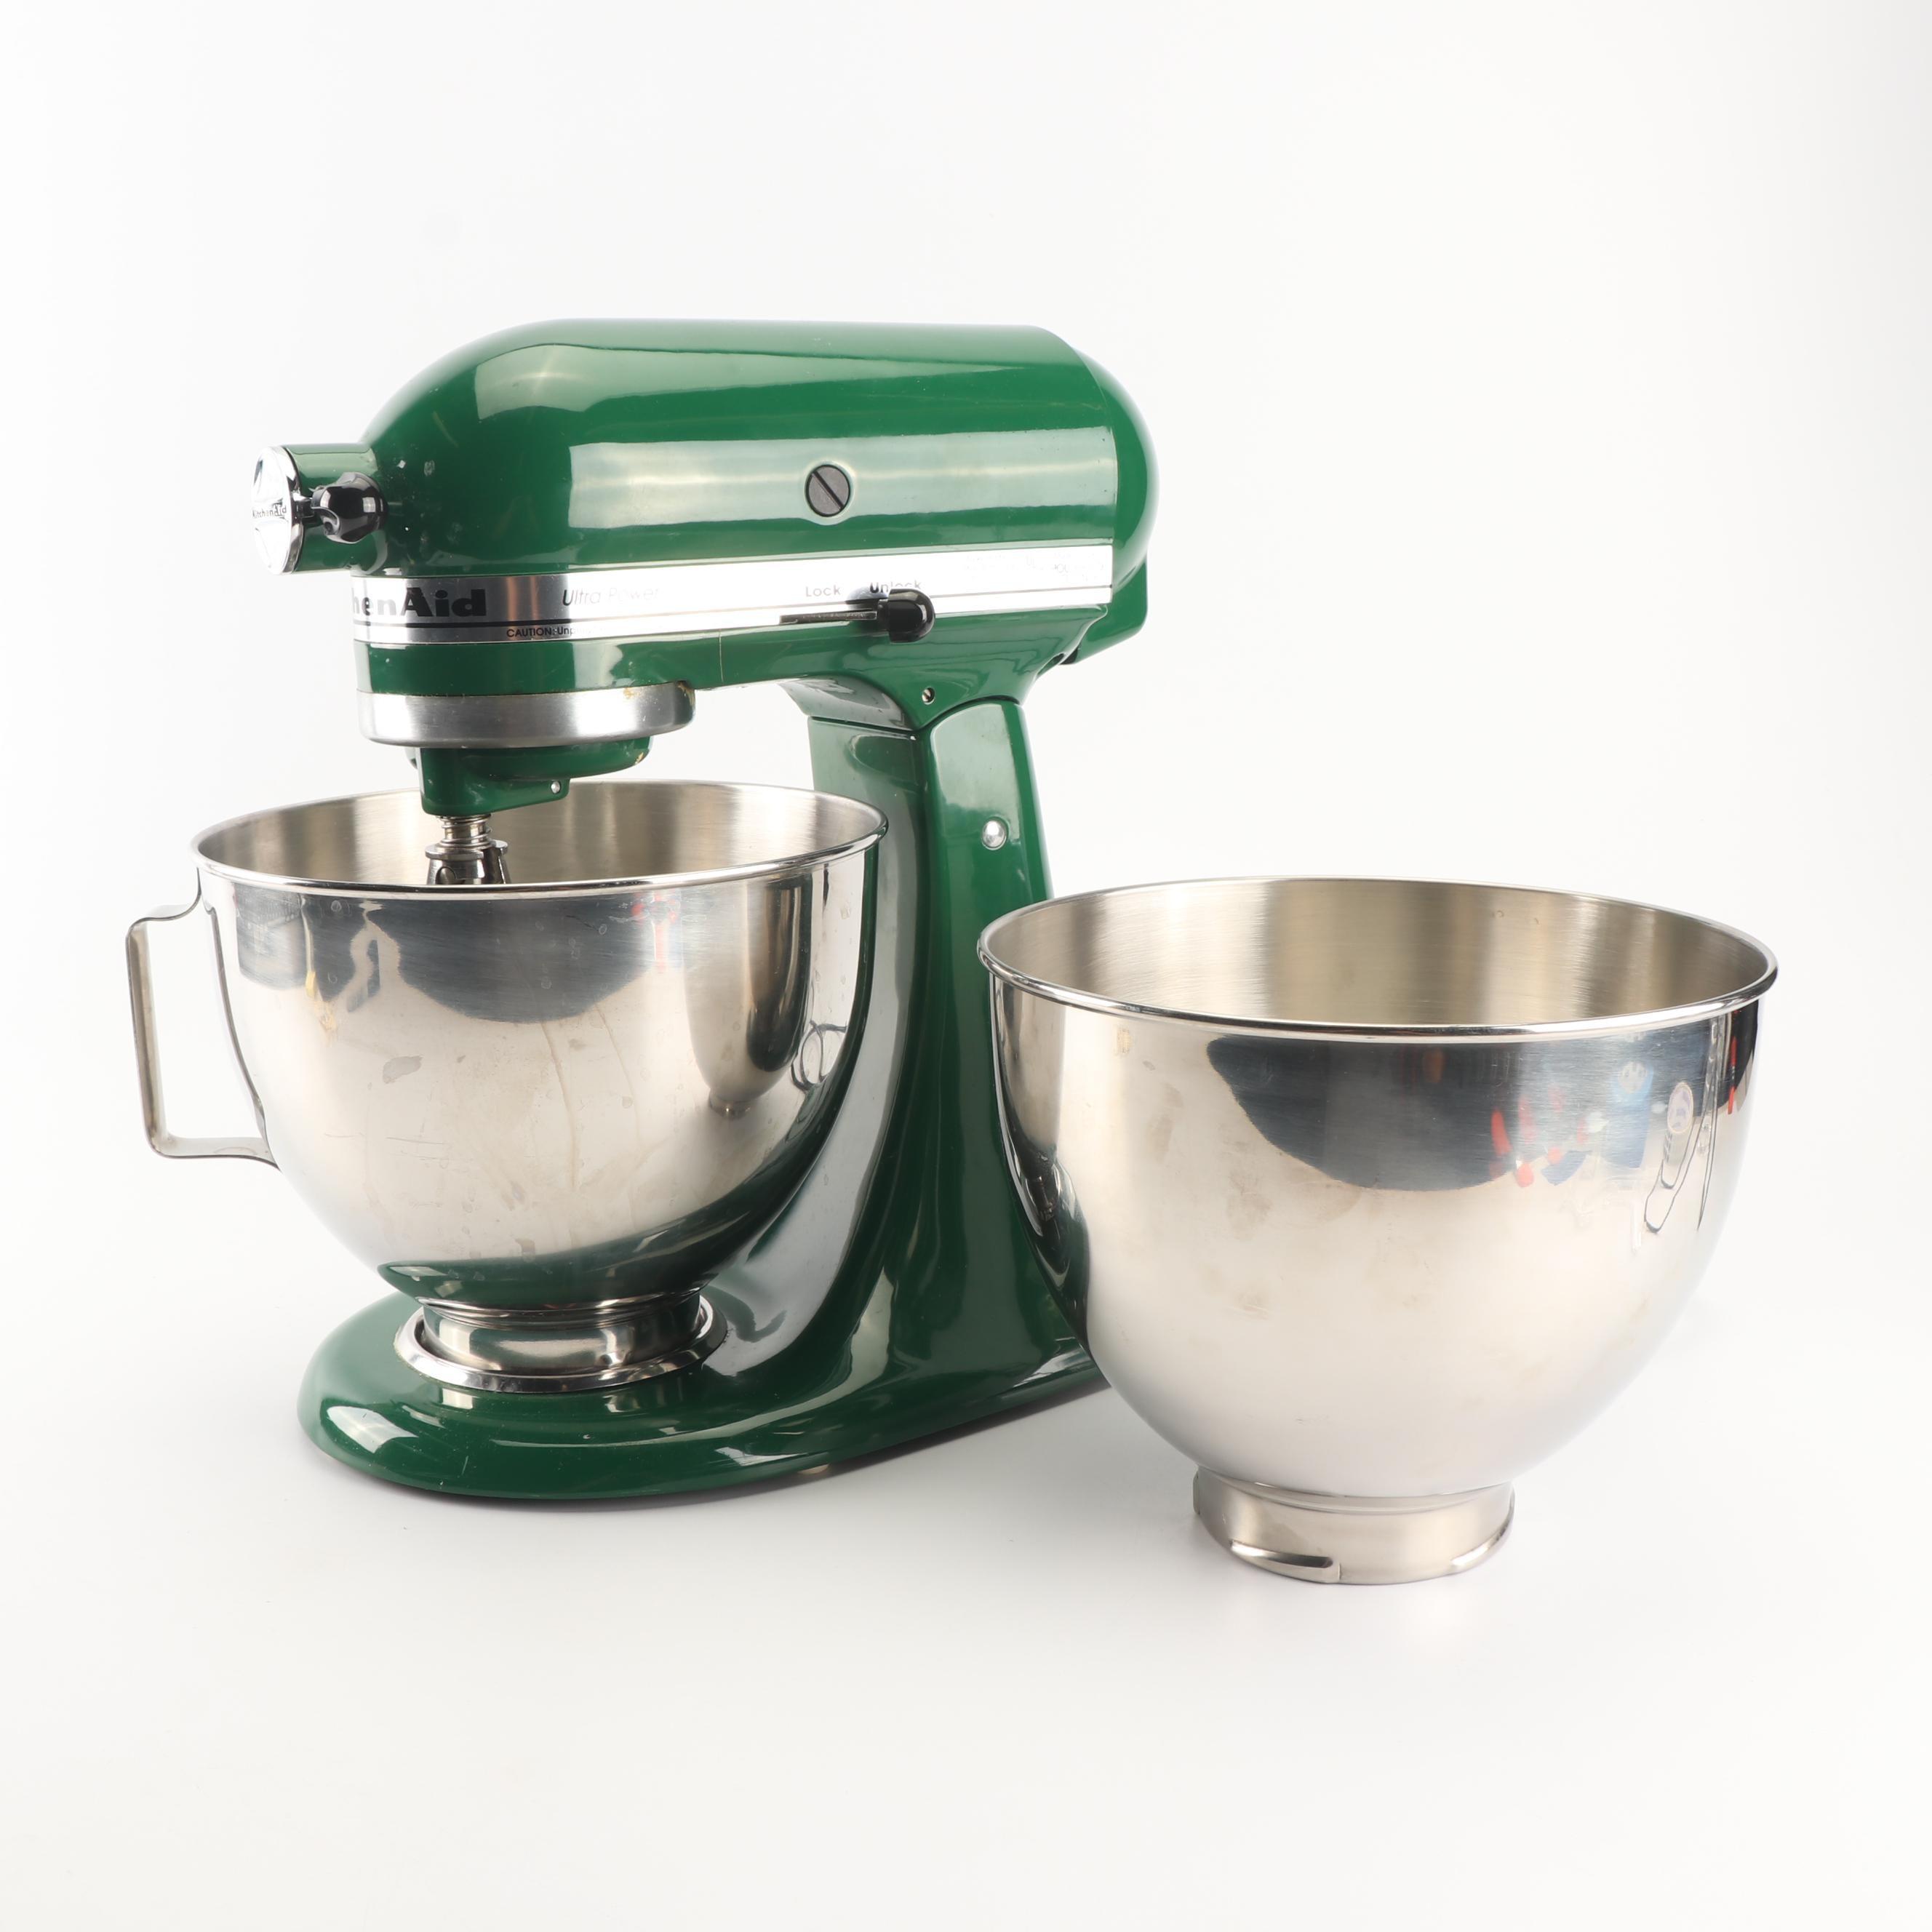 KitchenAid KSM90 300-Watt Stand Mixer